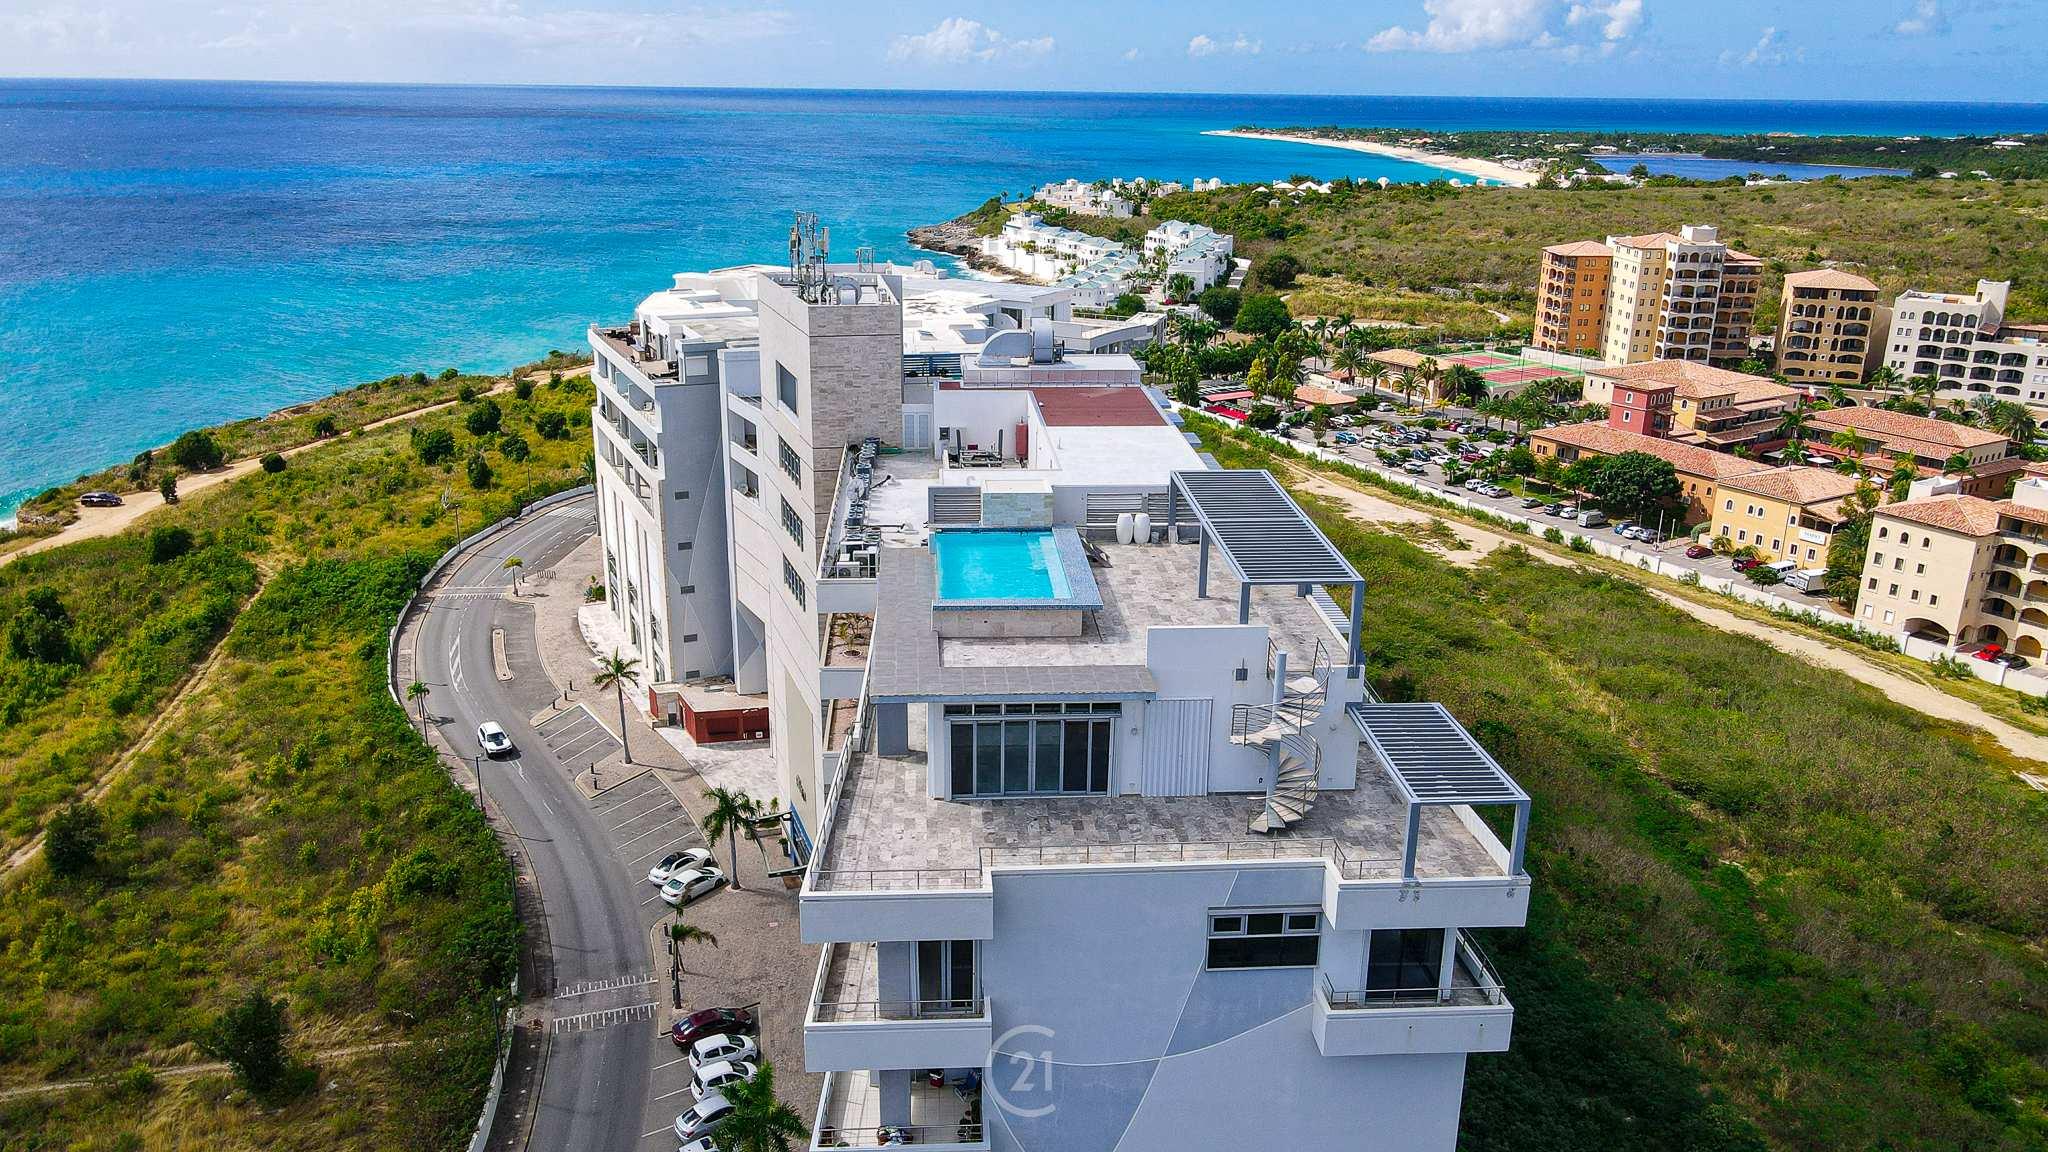 Blue Mall Residences Duplex St Maarten Penthouse For Sale